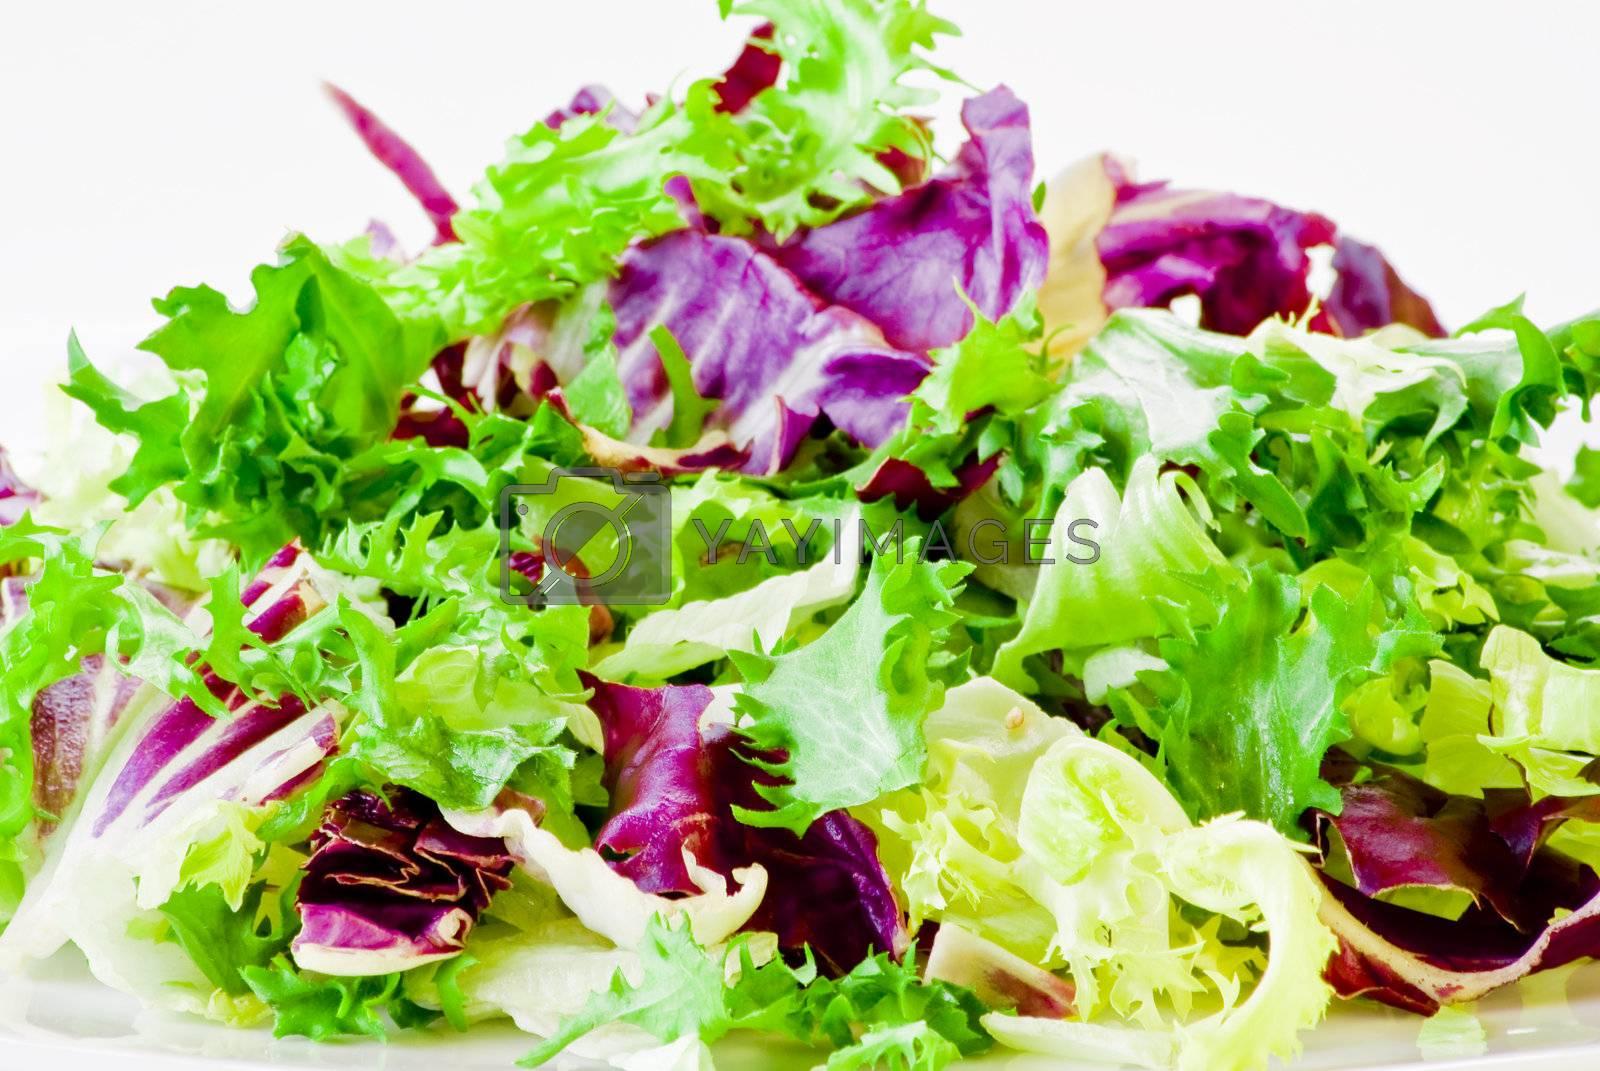 Various salad leaves by caldix